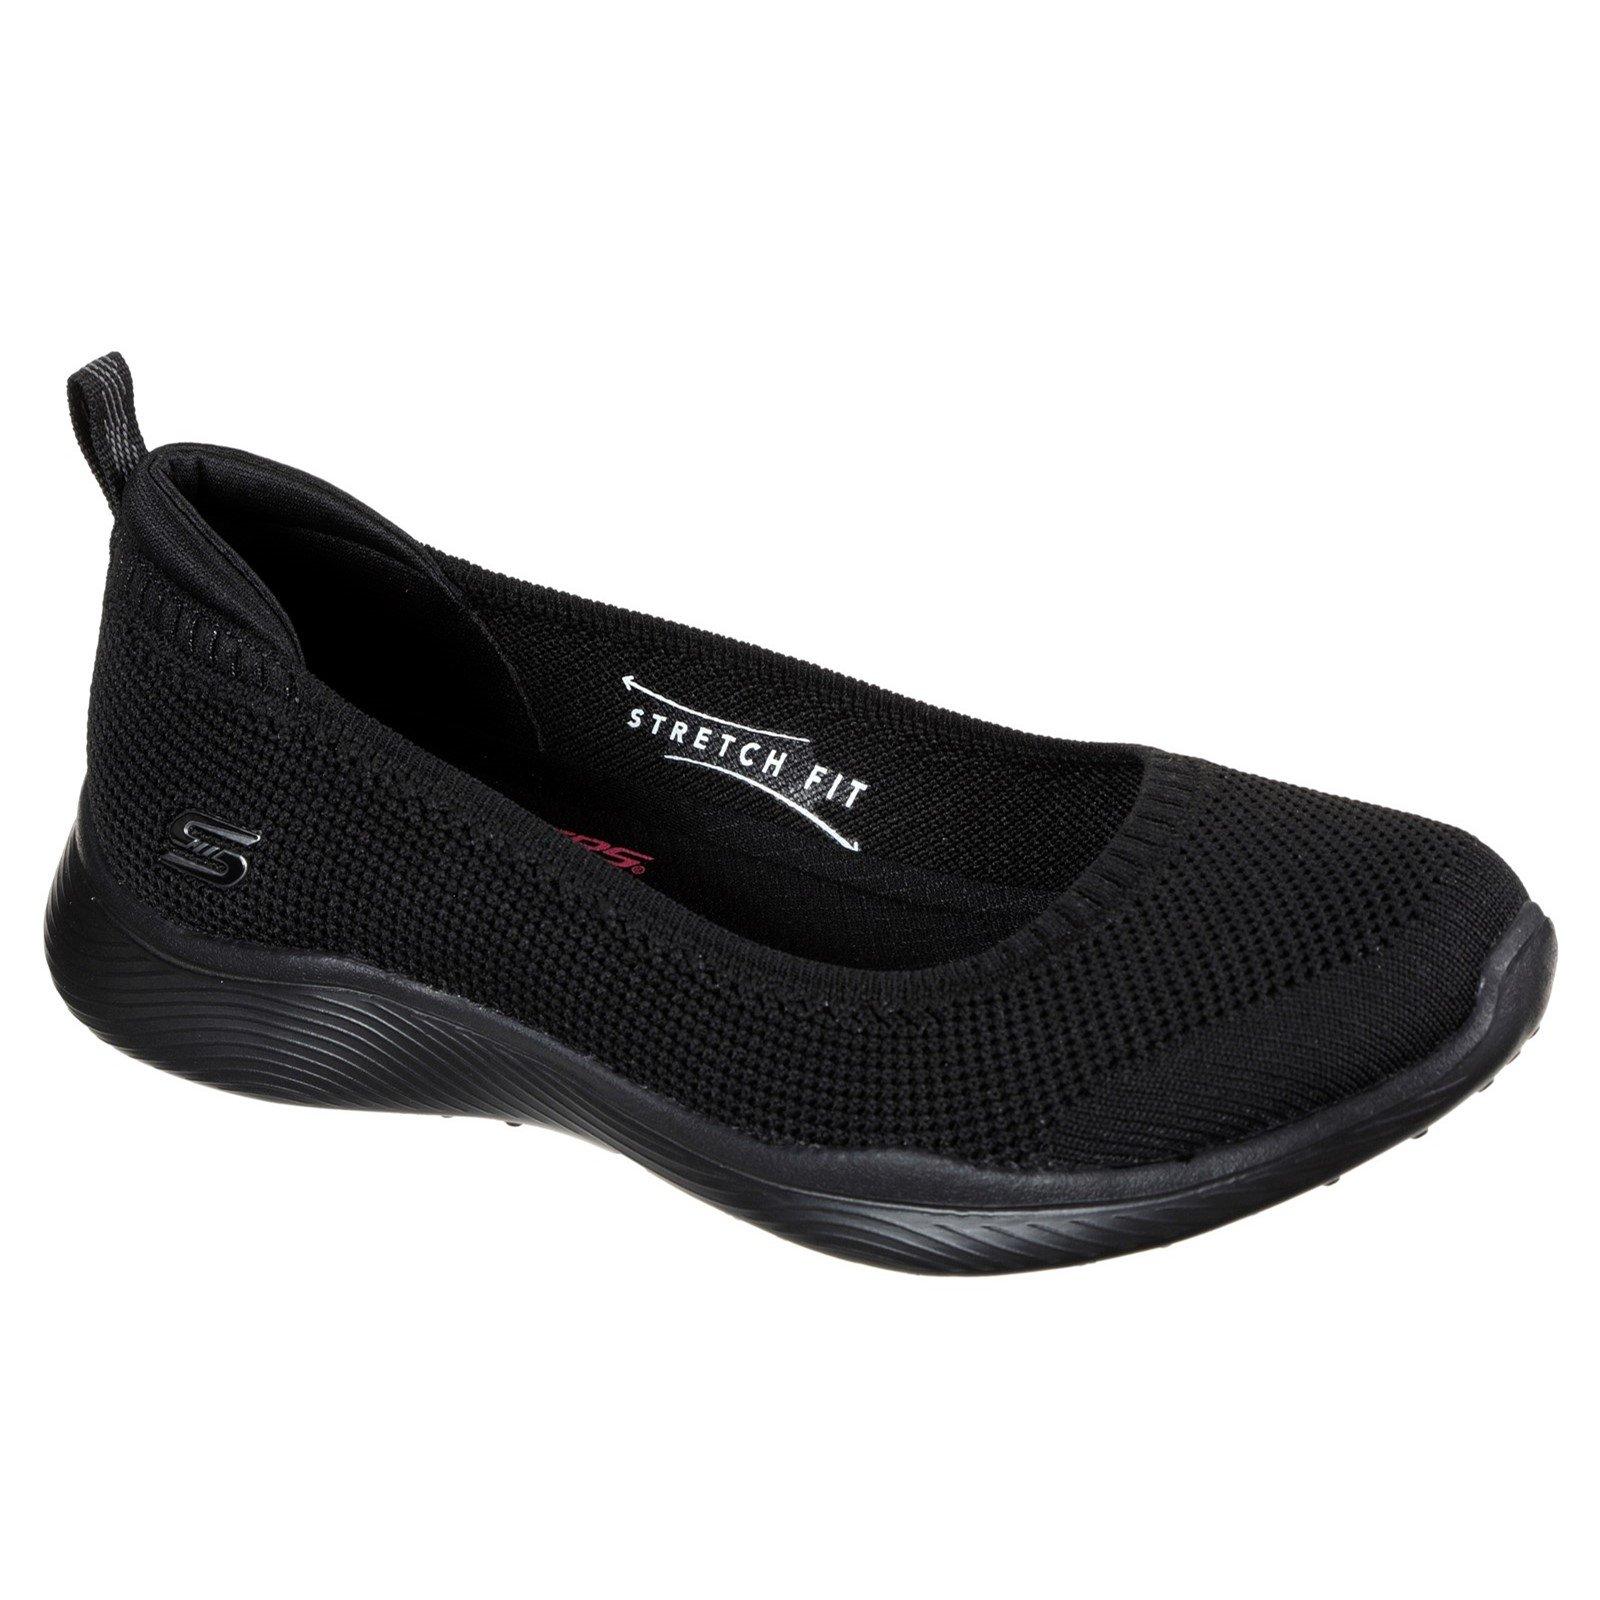 Skechers Women's Microburst 2.0 Be Iconic Wide Trainer Black 33069 - Black 7